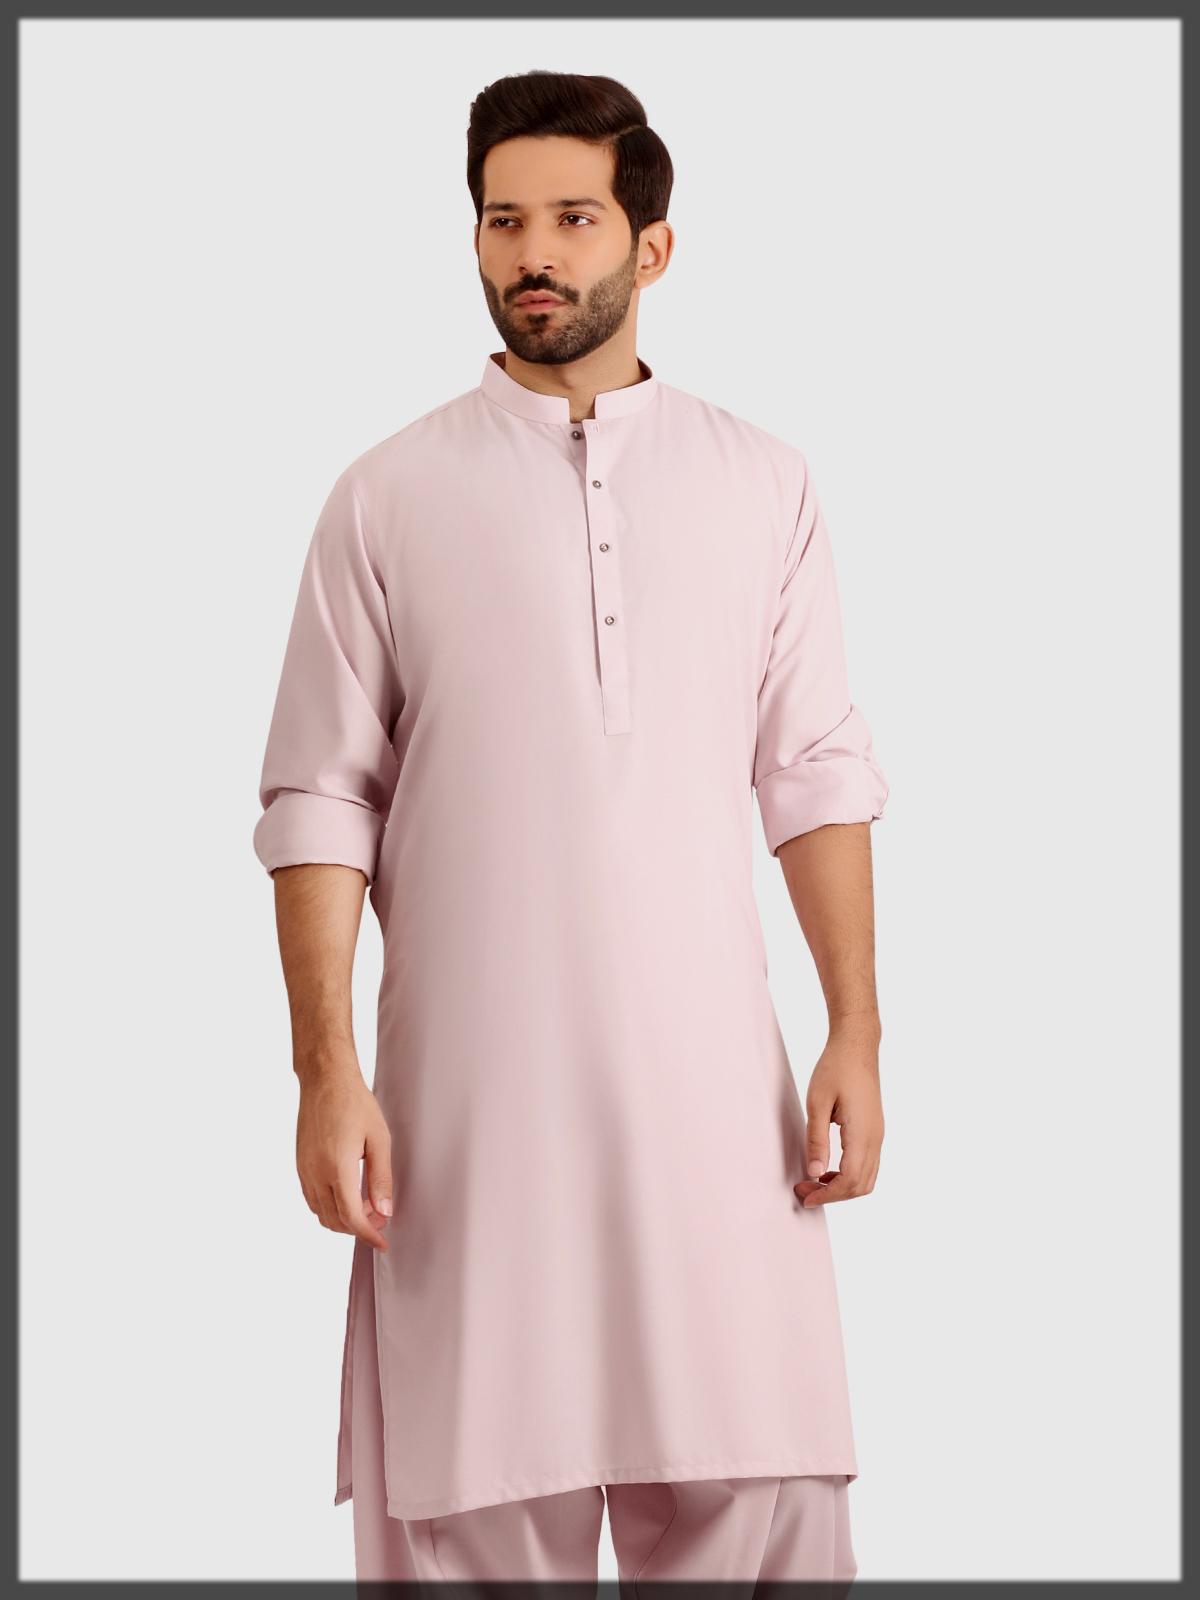 Splendid Light Pink Eden Robe Outfit